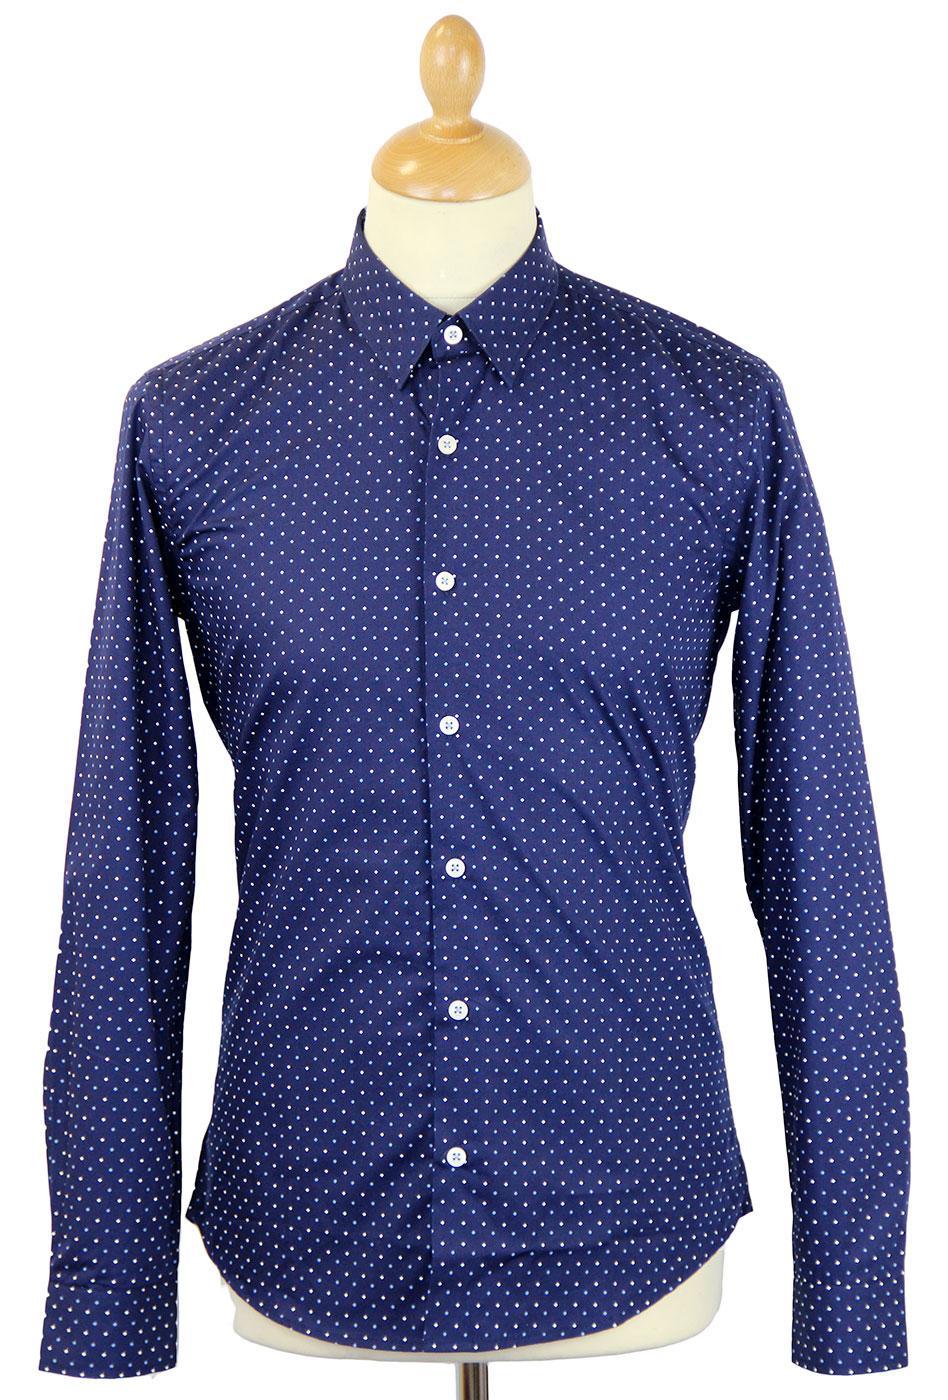 Edom PETER WERTH Retro 60s Mod Diamond Spot Shirt